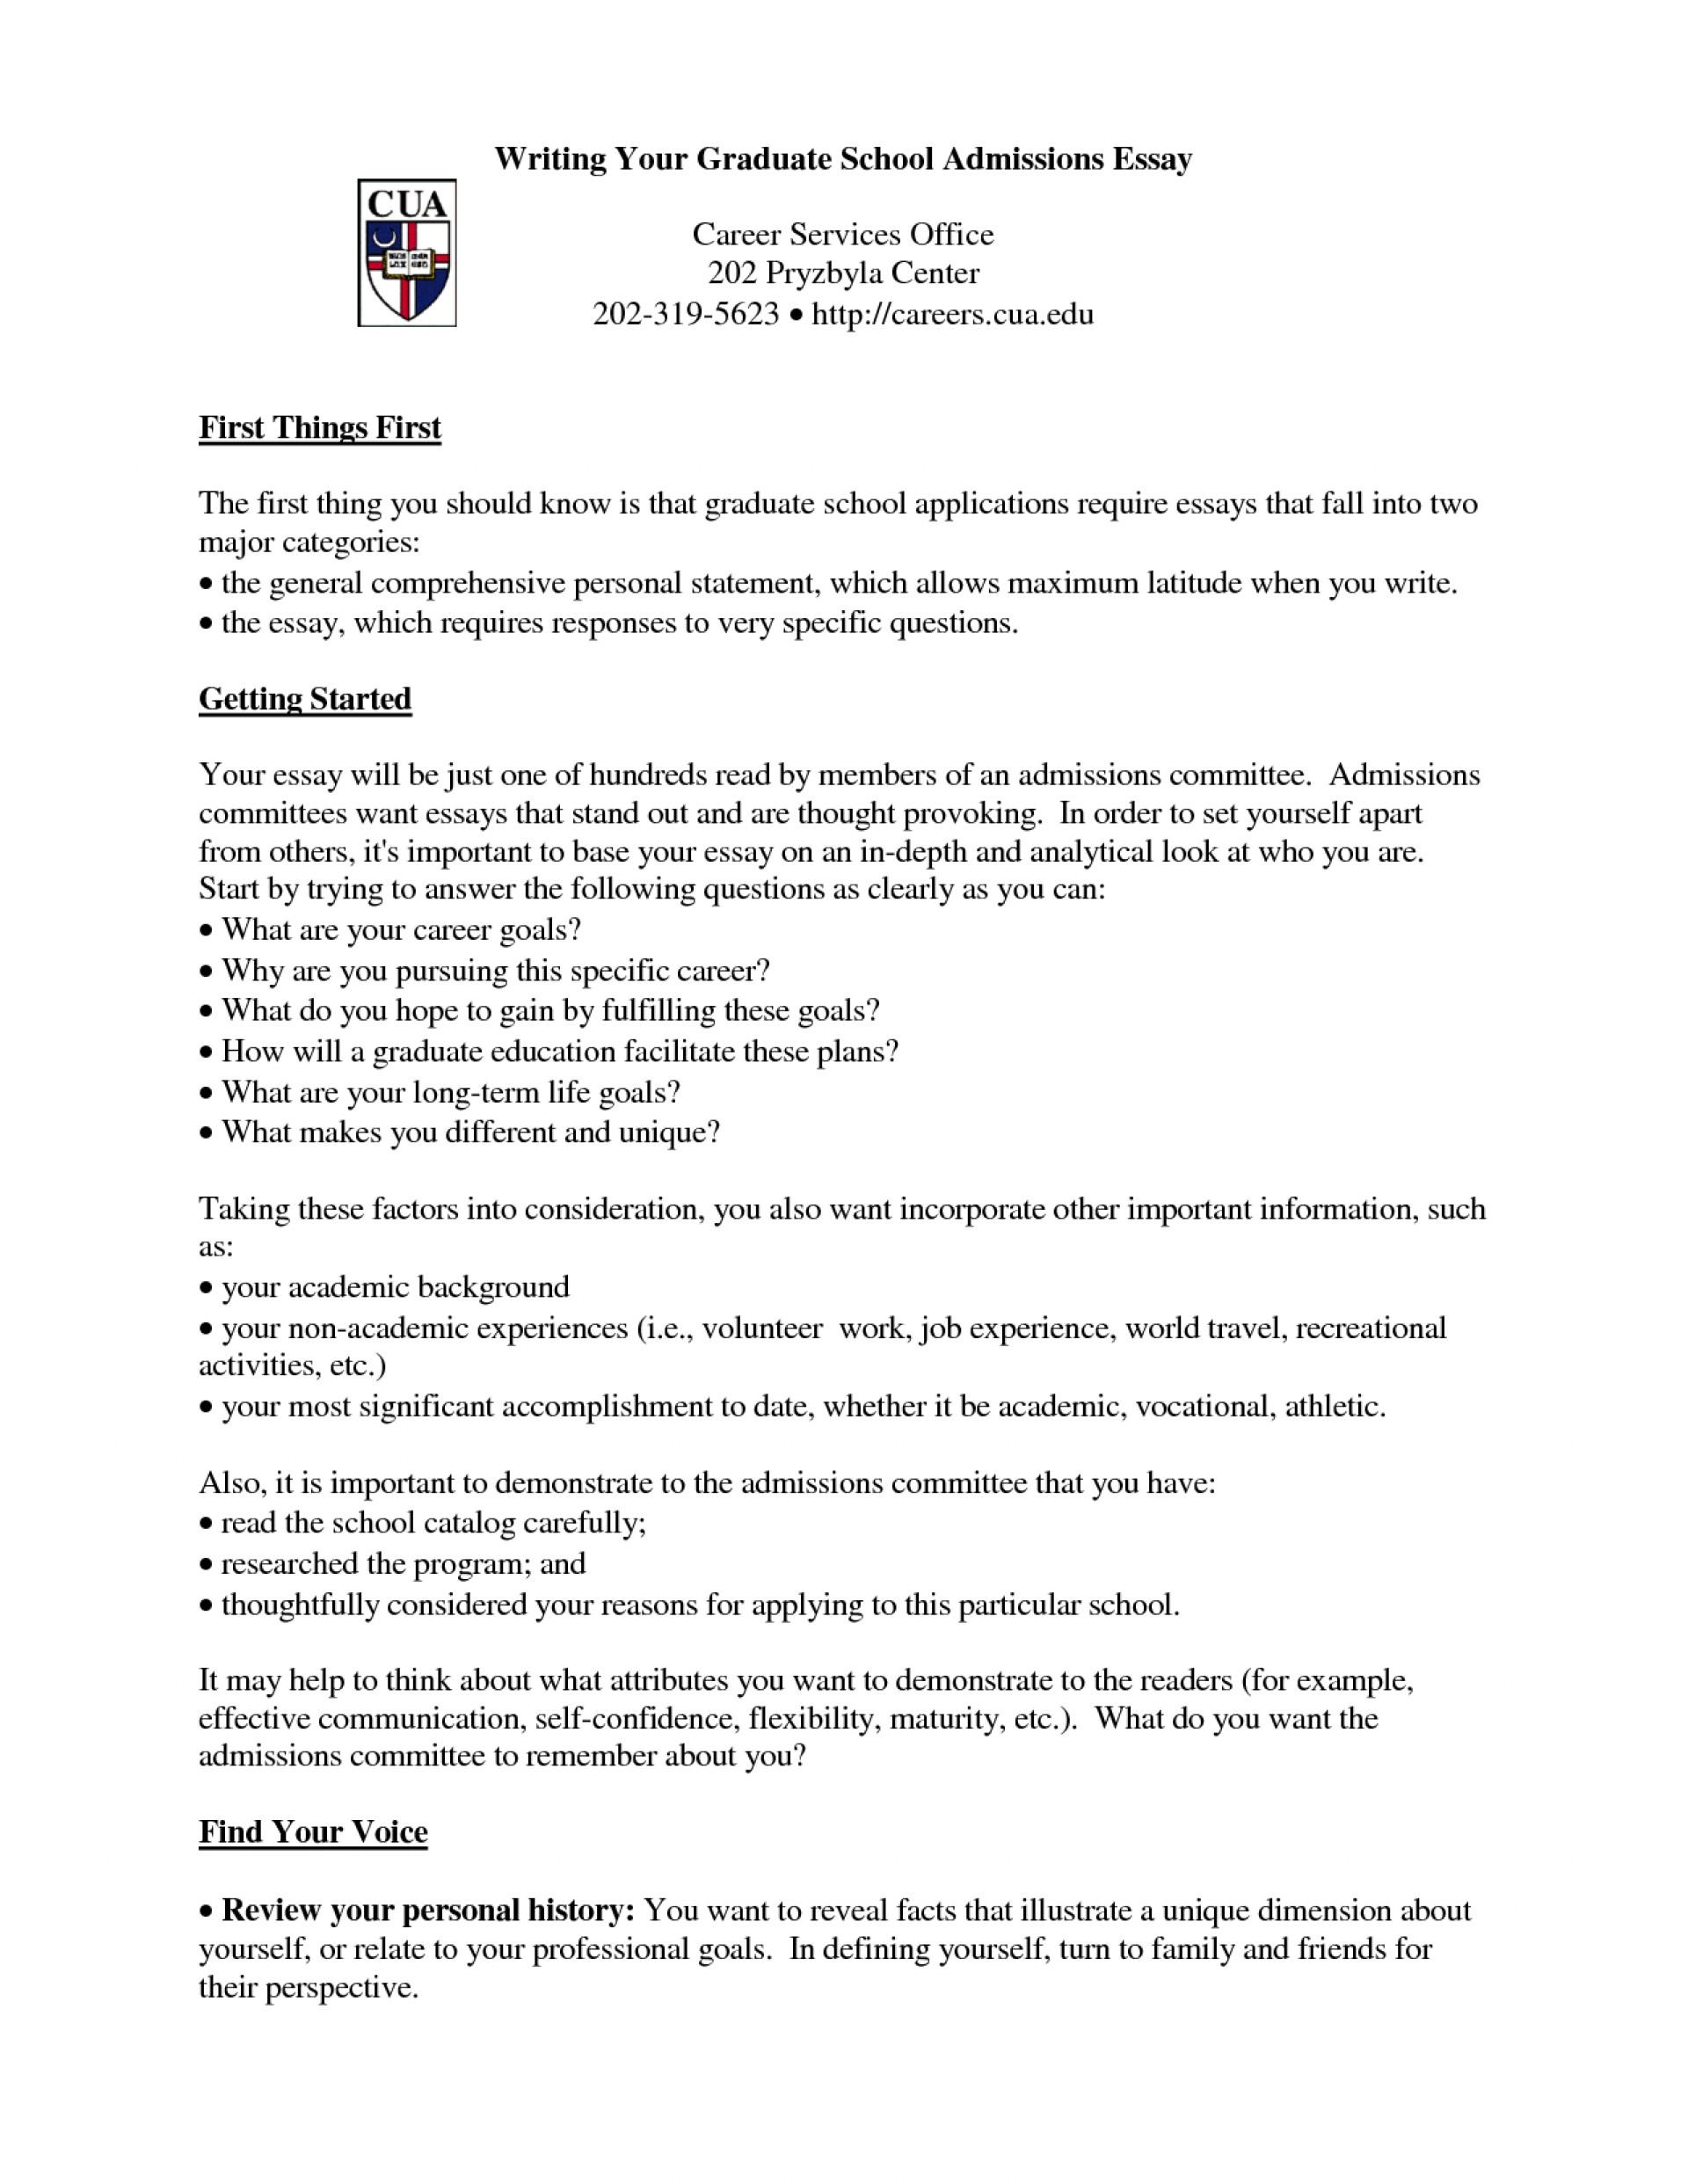 002 Essay Example Free Sample For Graduate School Admission Formidable Pdf 1920